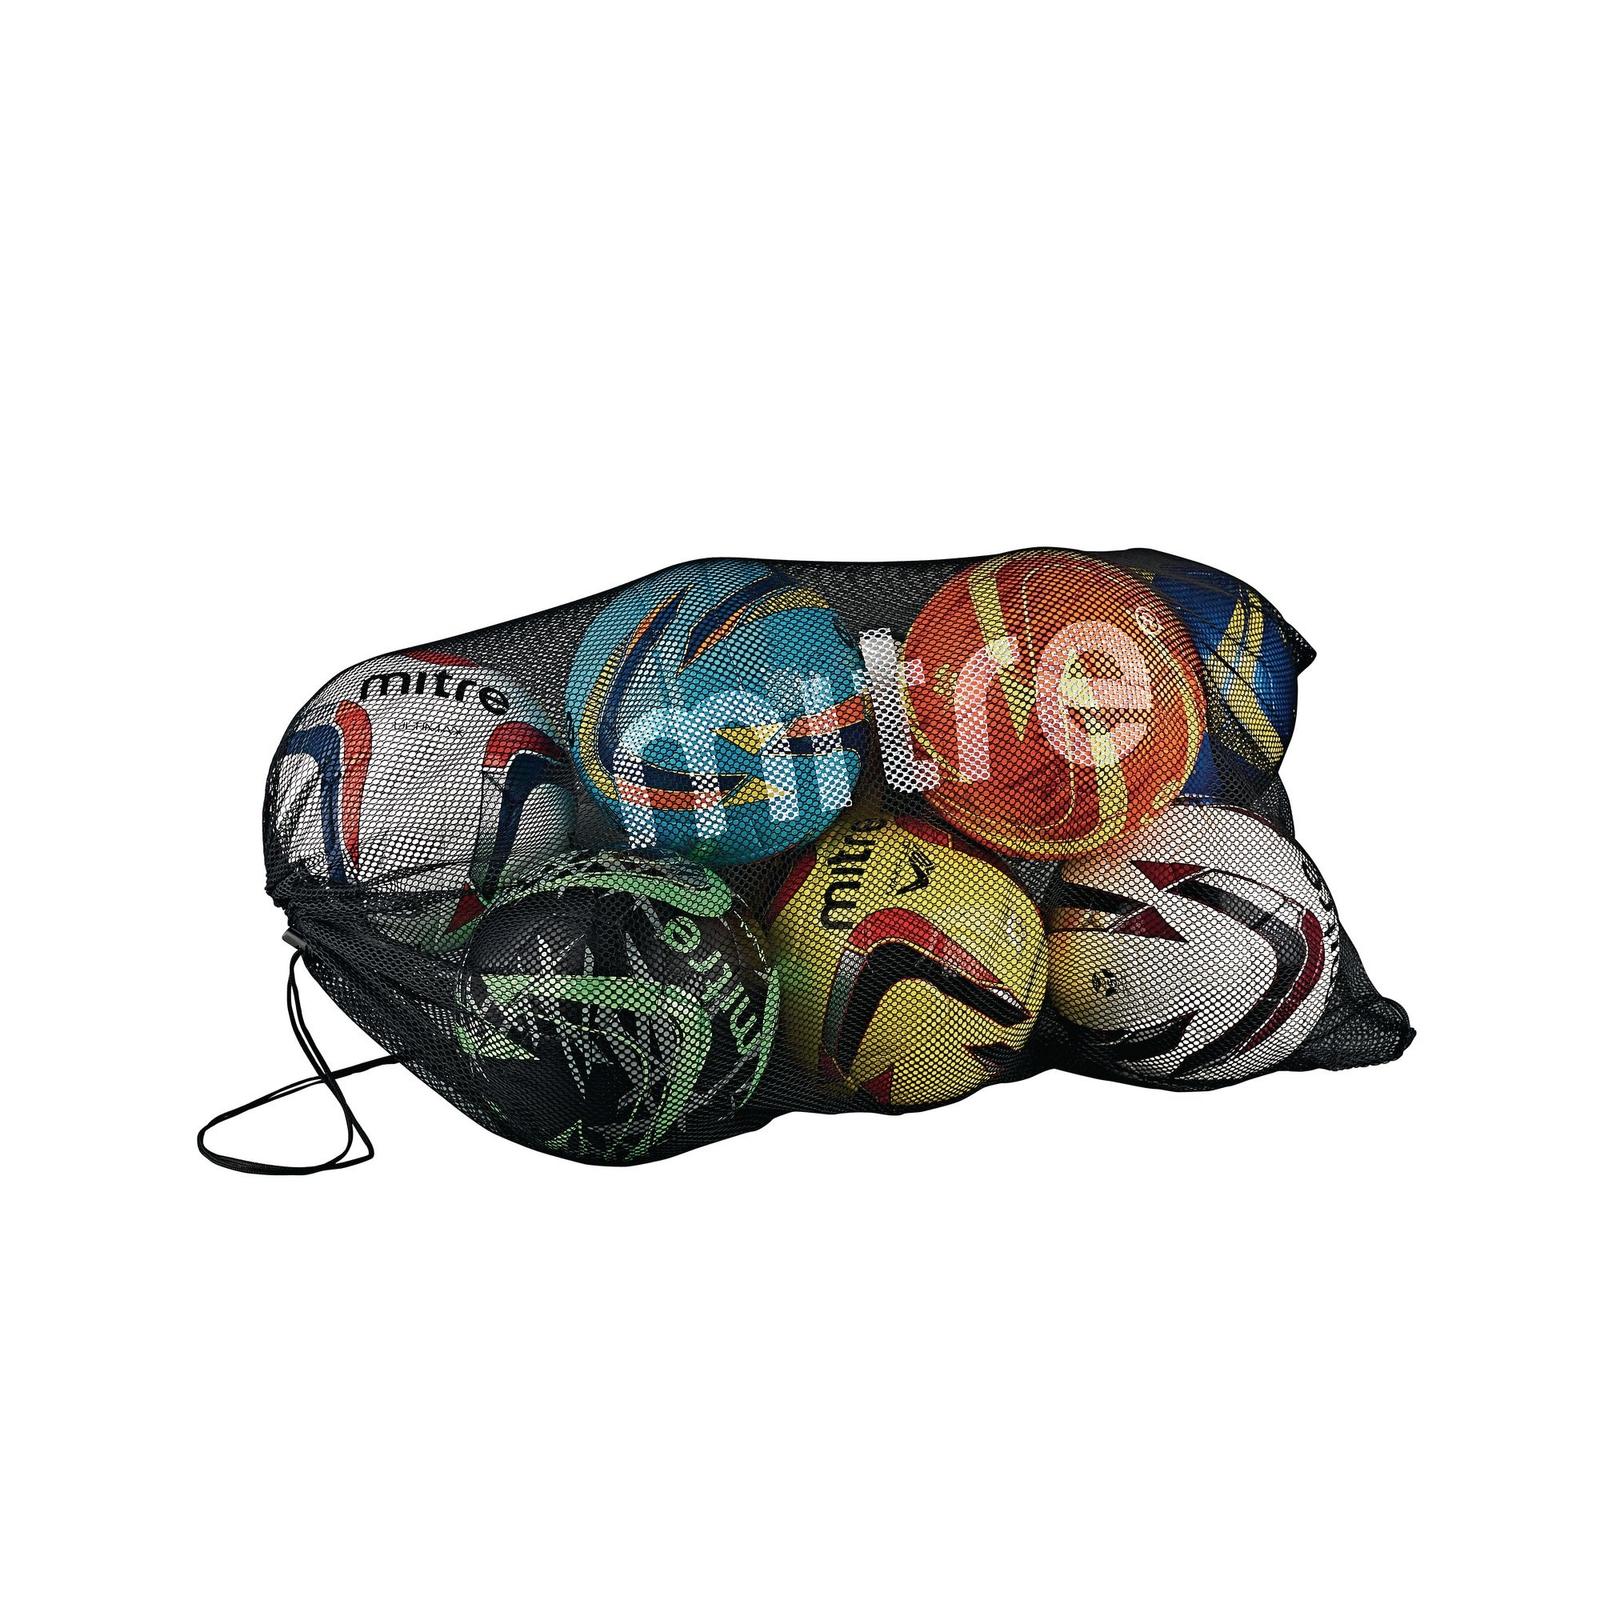 Mitre Mesh Ball Carrying Bag